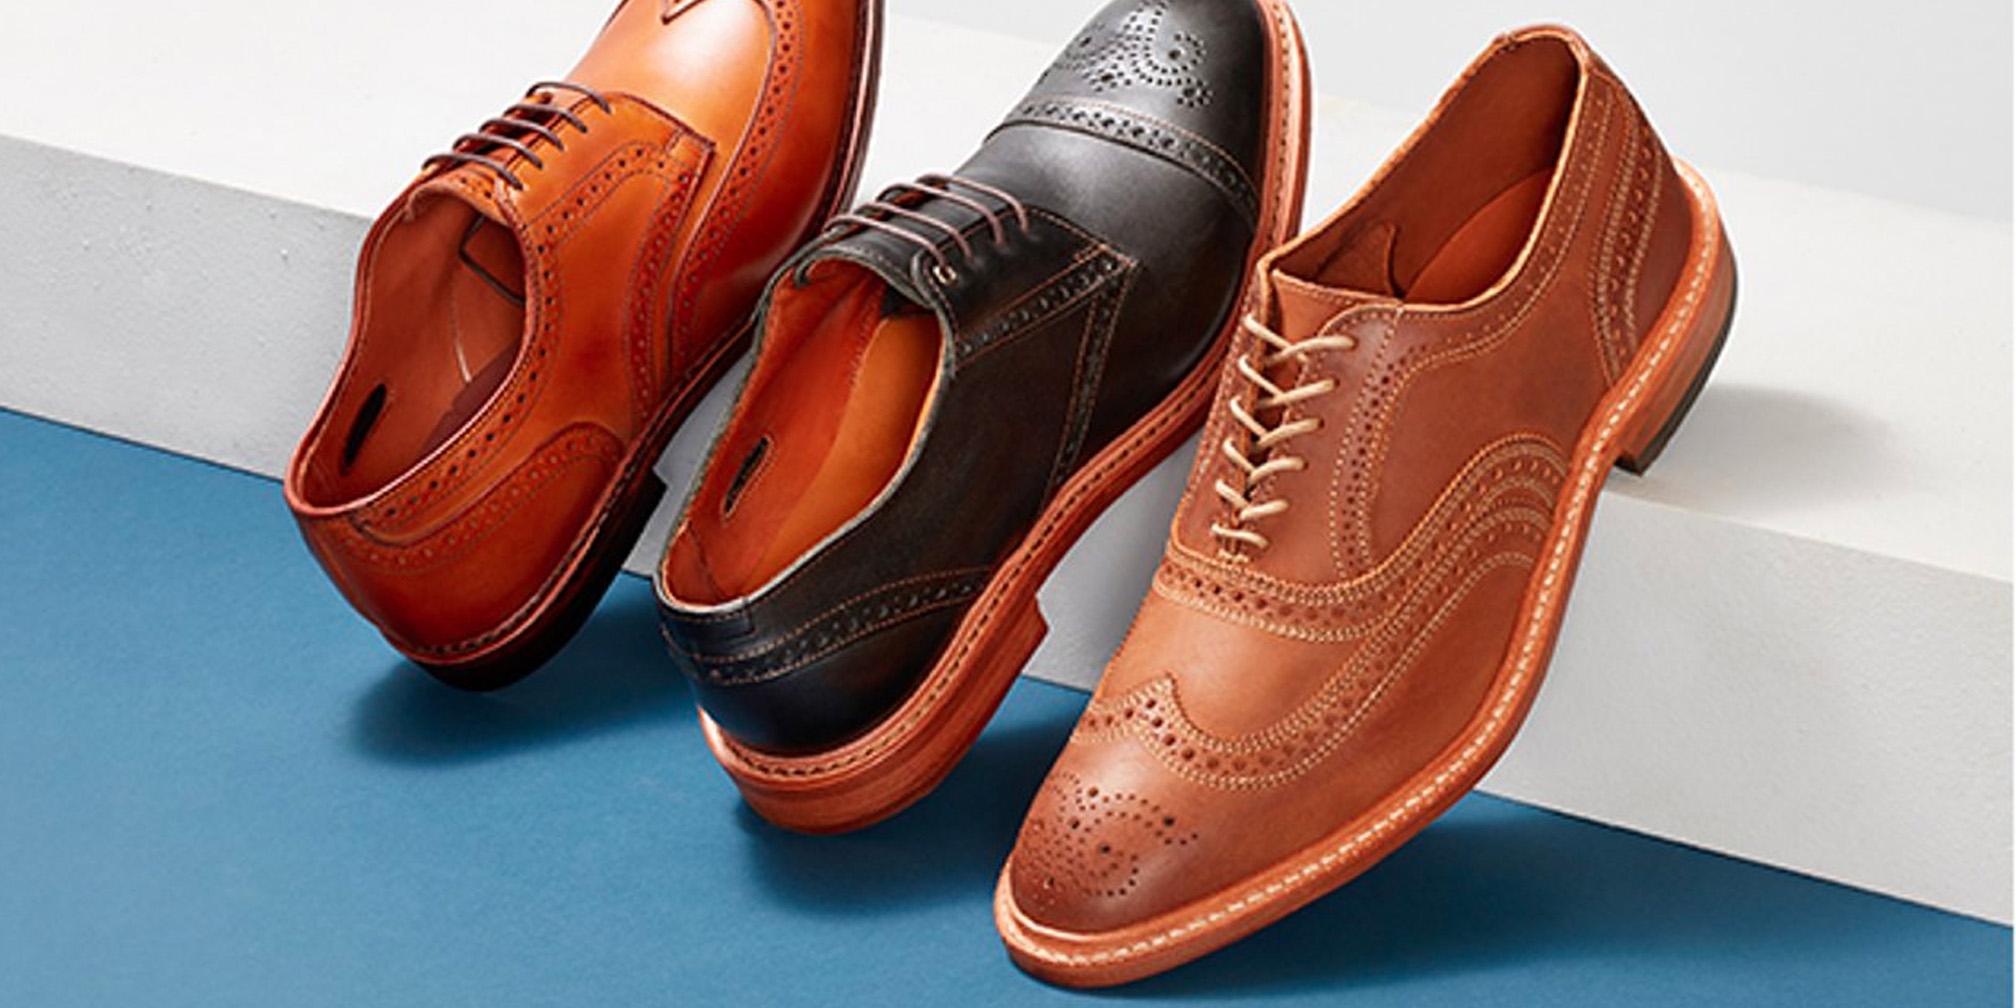 Allen Edmonds Factory-Seconds Sale takes an extra 20% off dress shoes, boots, more